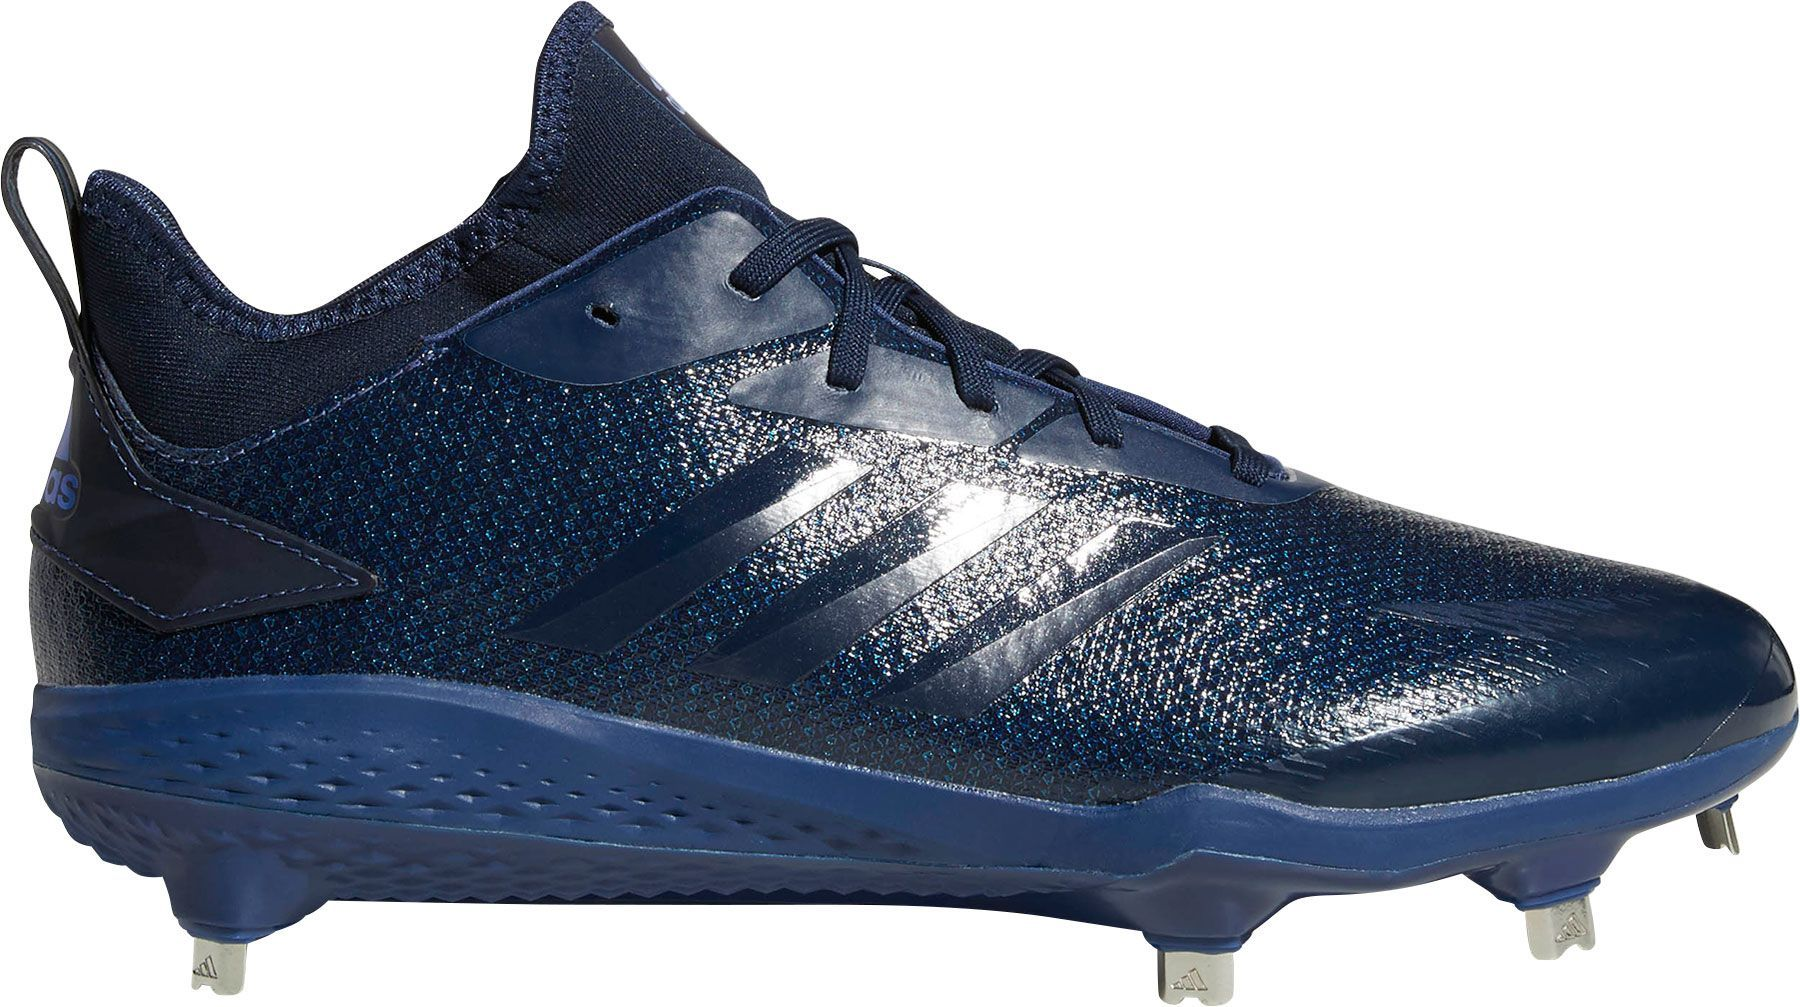 19f10205f3 adidas Men s adiZERO Afterburner V Dipped Metal Baseball Cleats ...